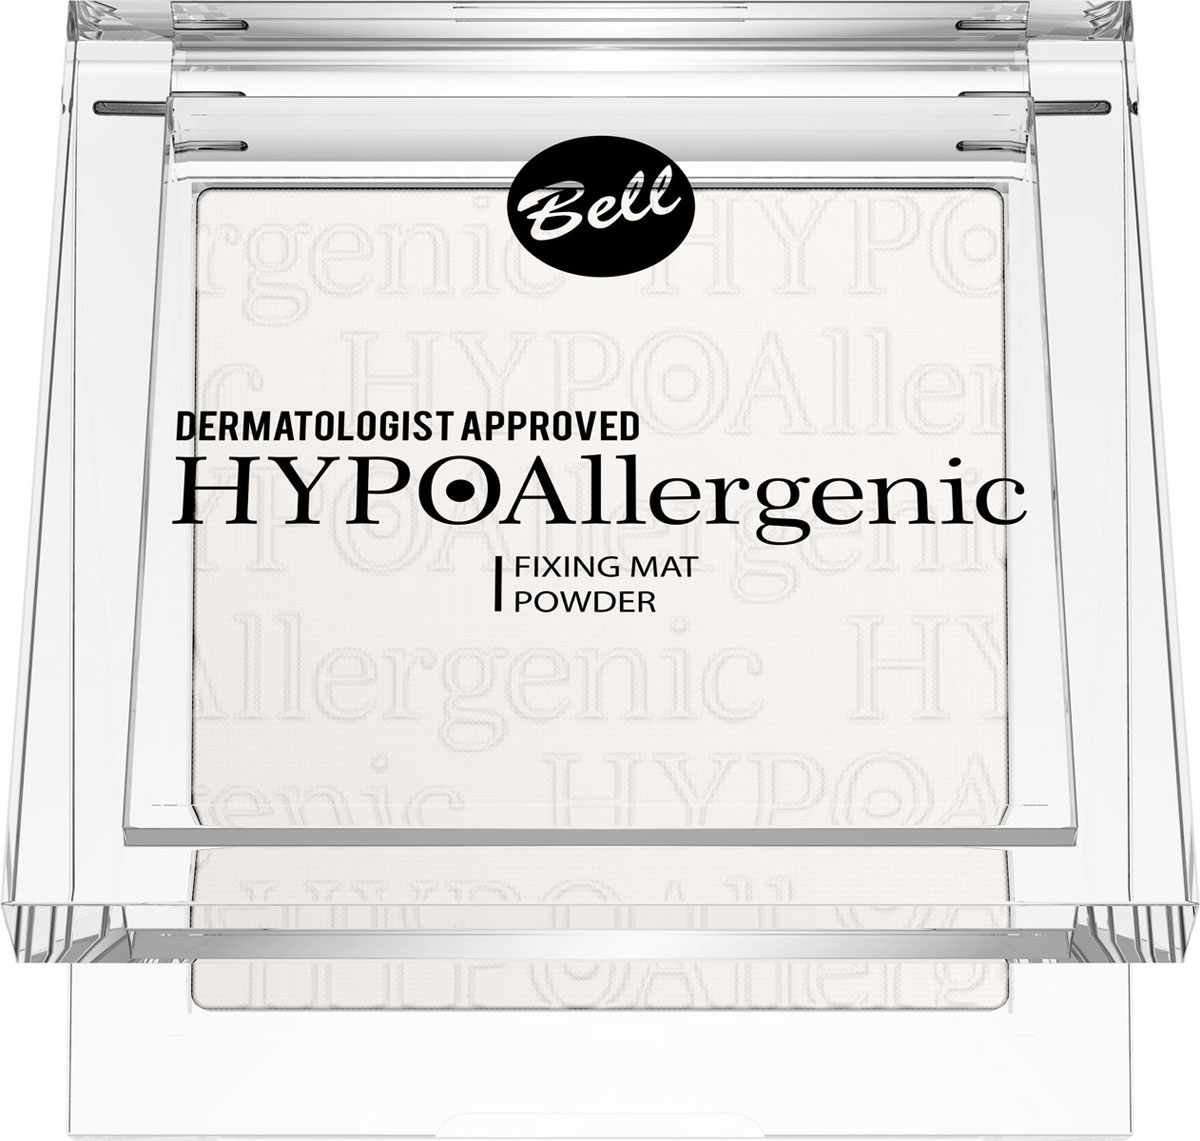 Bell Hypoallergenic Пудра, фиксирующая макияж, гипоаллергенная Fixing Mat Powder, Тон №01